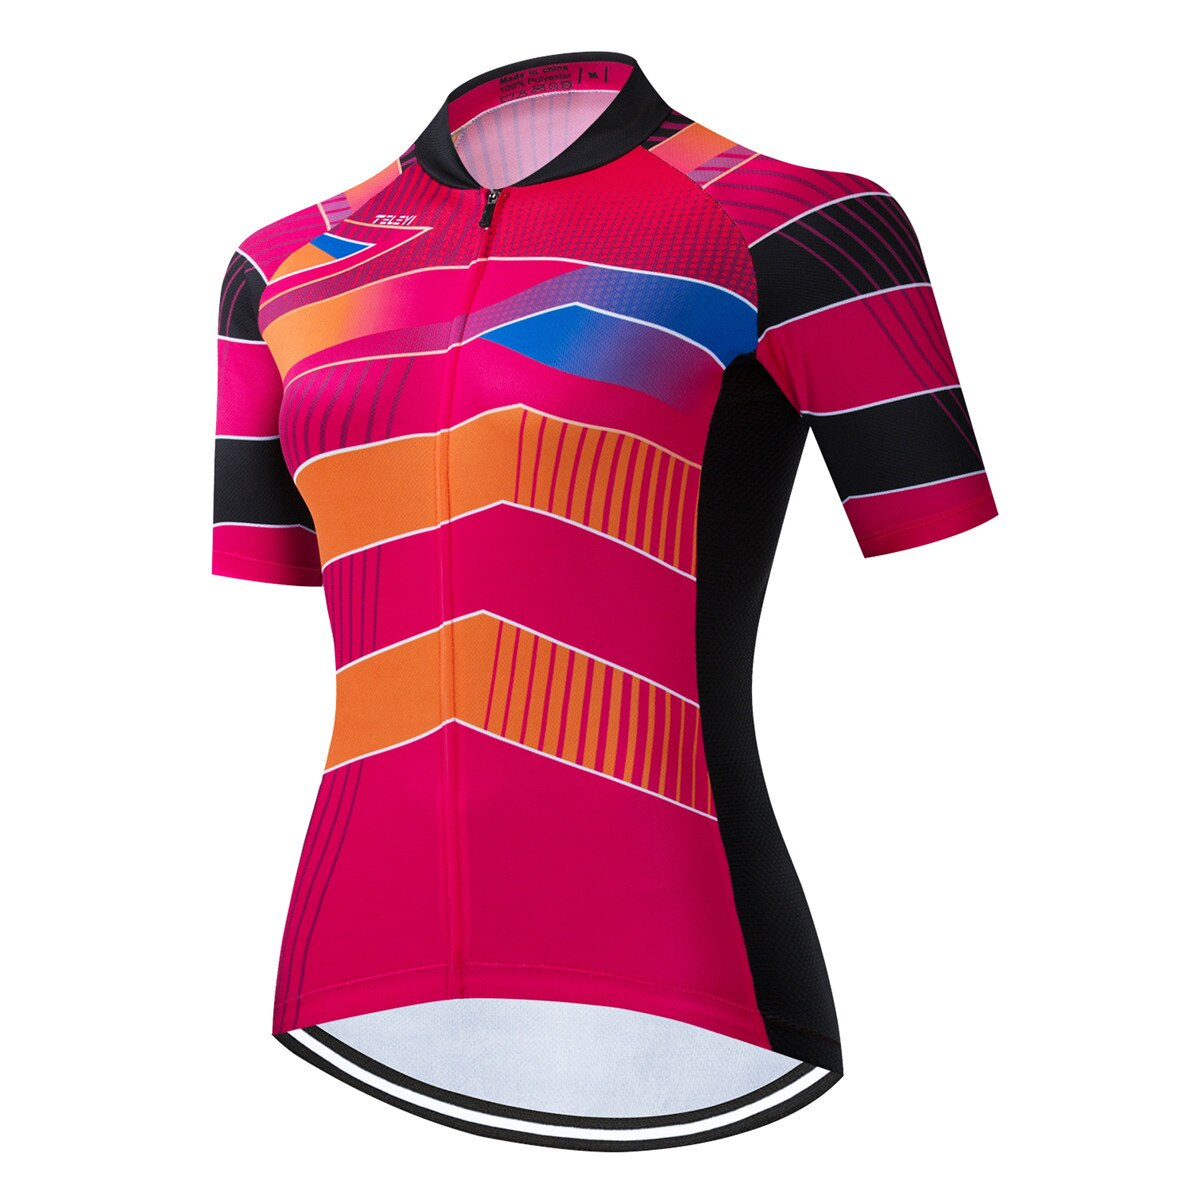 2020, Jersey de Ciclismo para mujer, camiseta de Ciclismo de carretera, camiseta de Ciclismo, Ropa de equipo, maillot de carreras, chaquetas femeninas, naranja, rojo